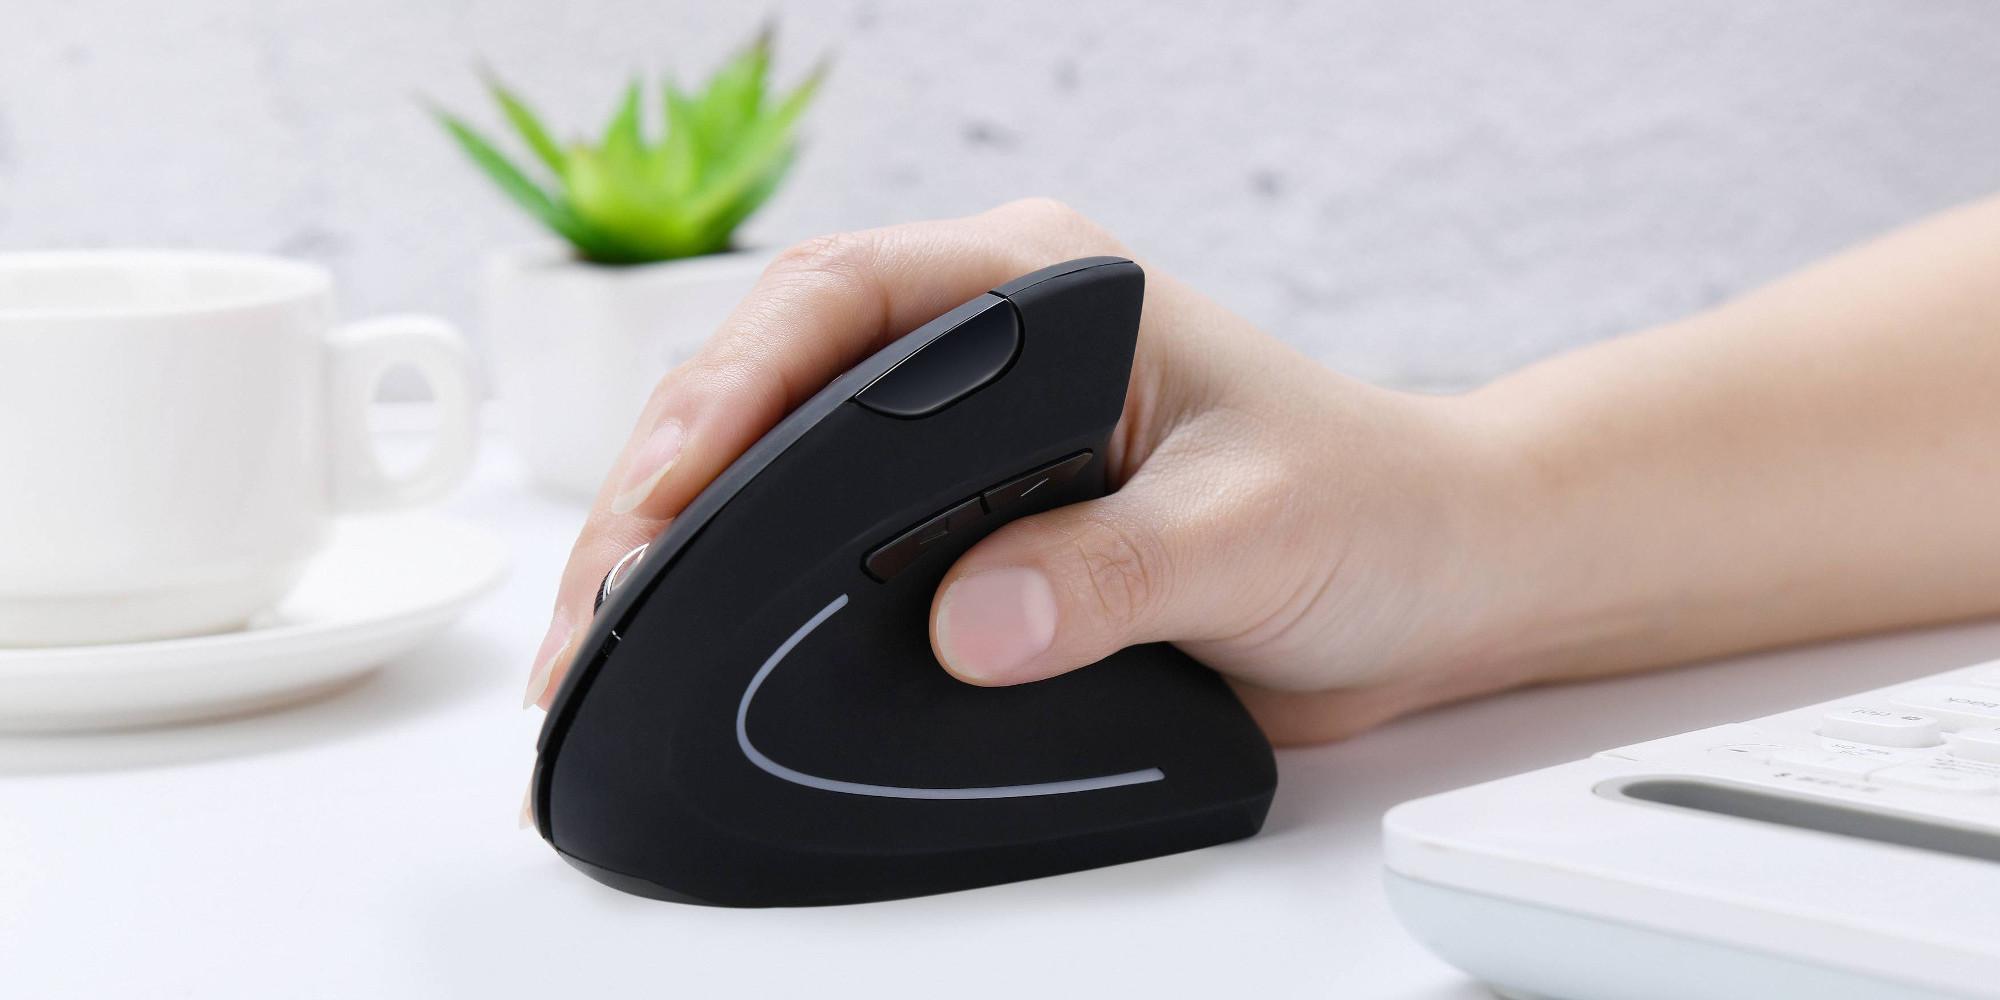 Apex Mouse